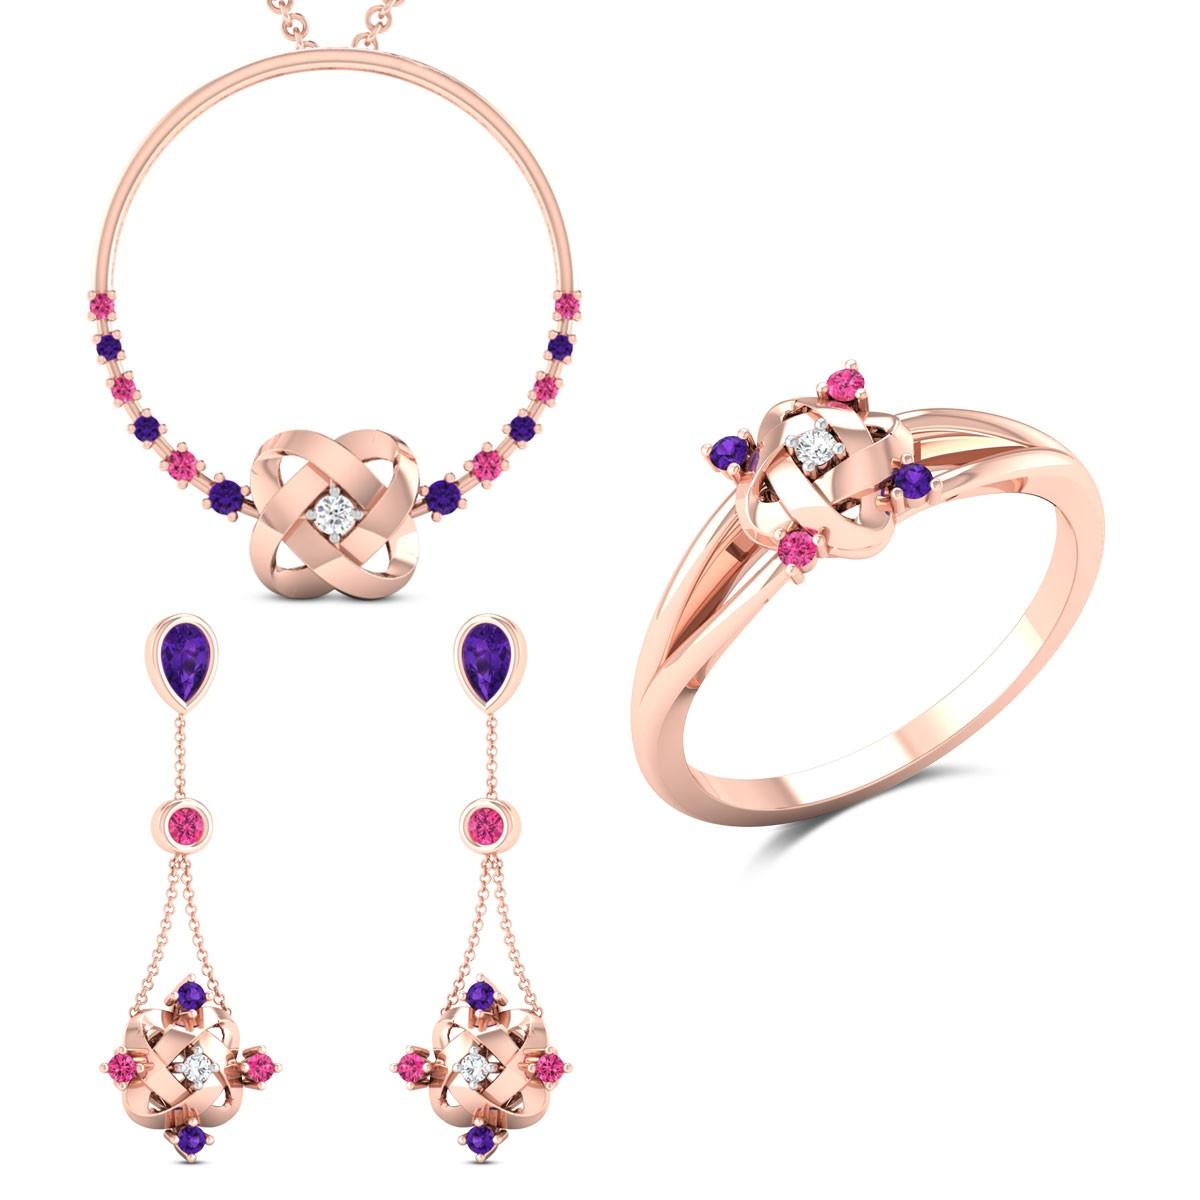 Liana Diamond Set